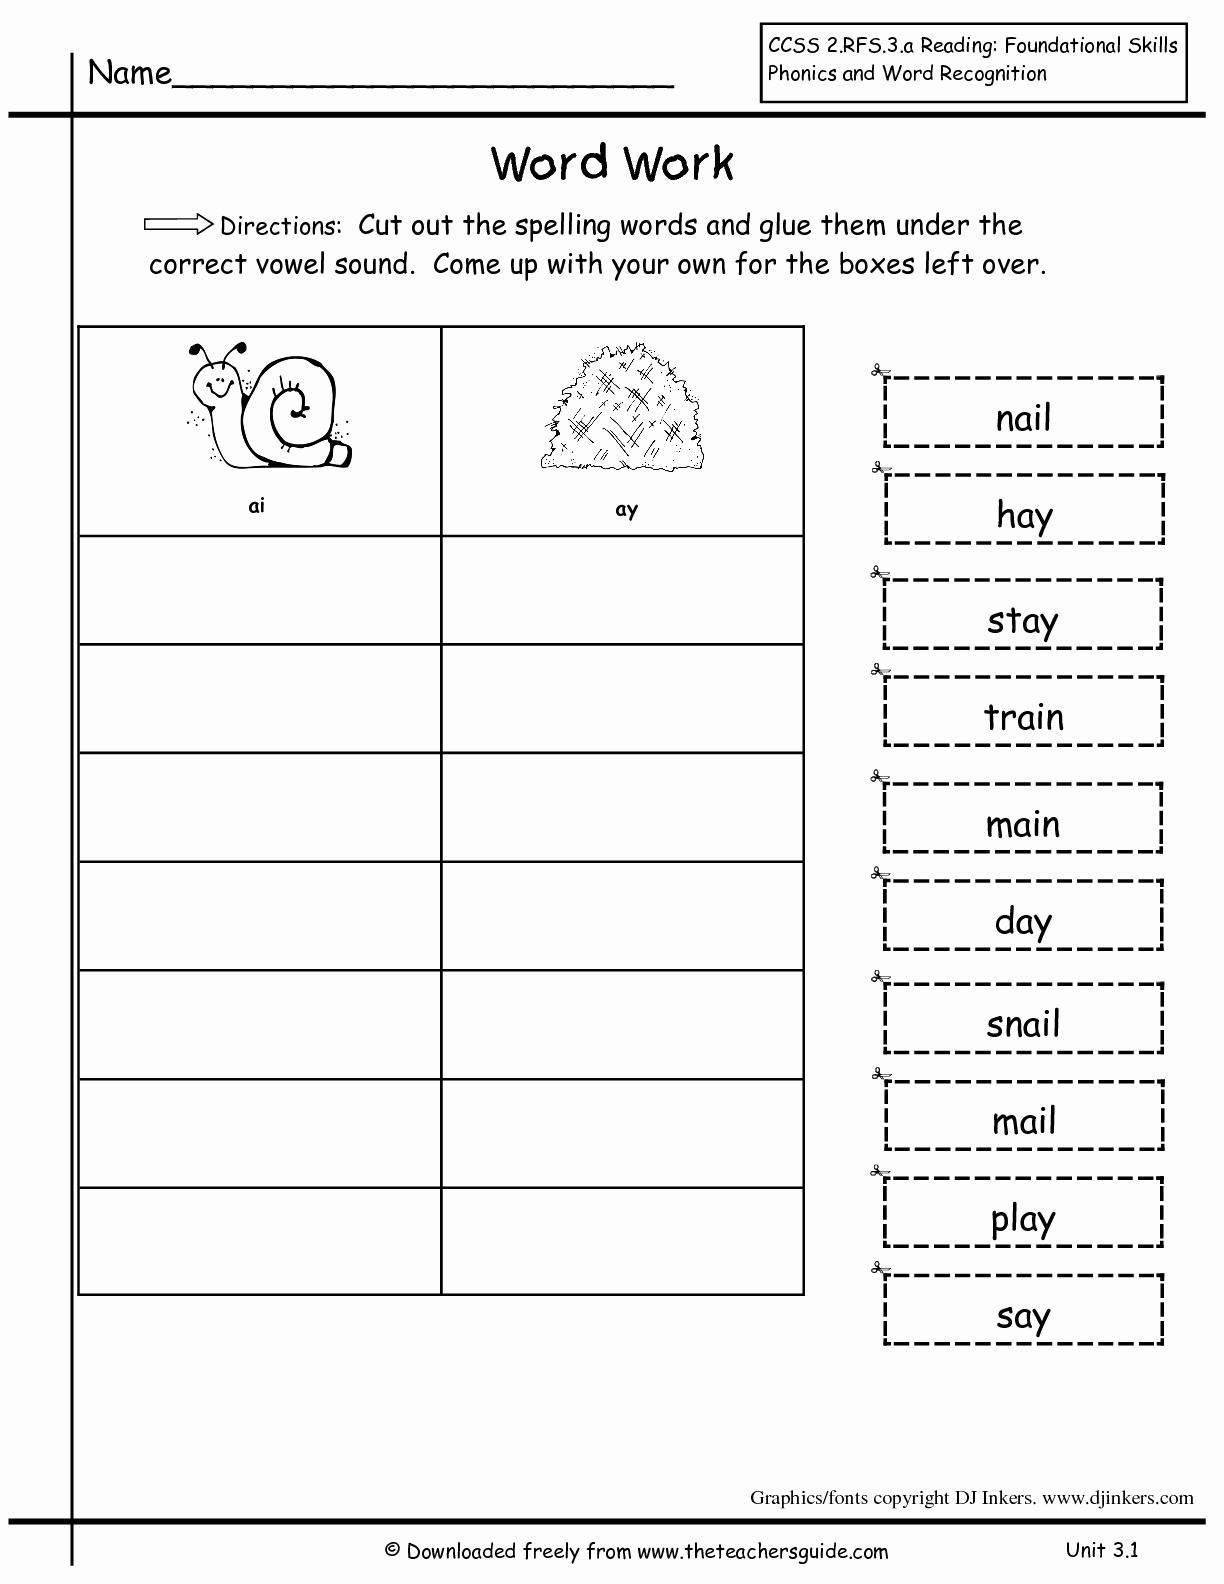 Second Grade Spelling Worksheets New 2nd Grade Spelling Worksheets to Printable 2nd Grade